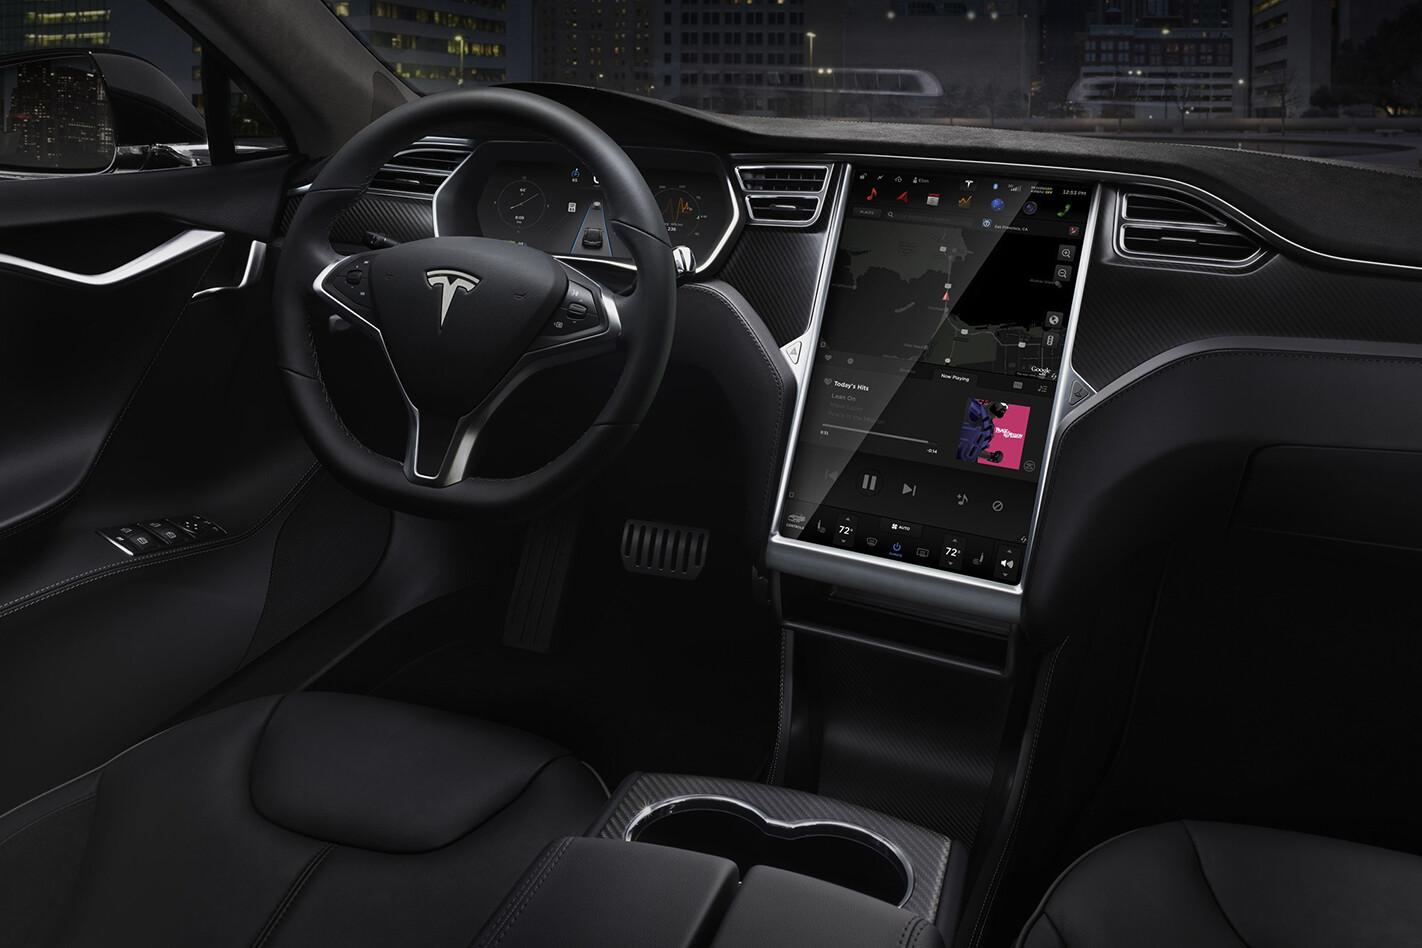 Tesla Model S interior LHD